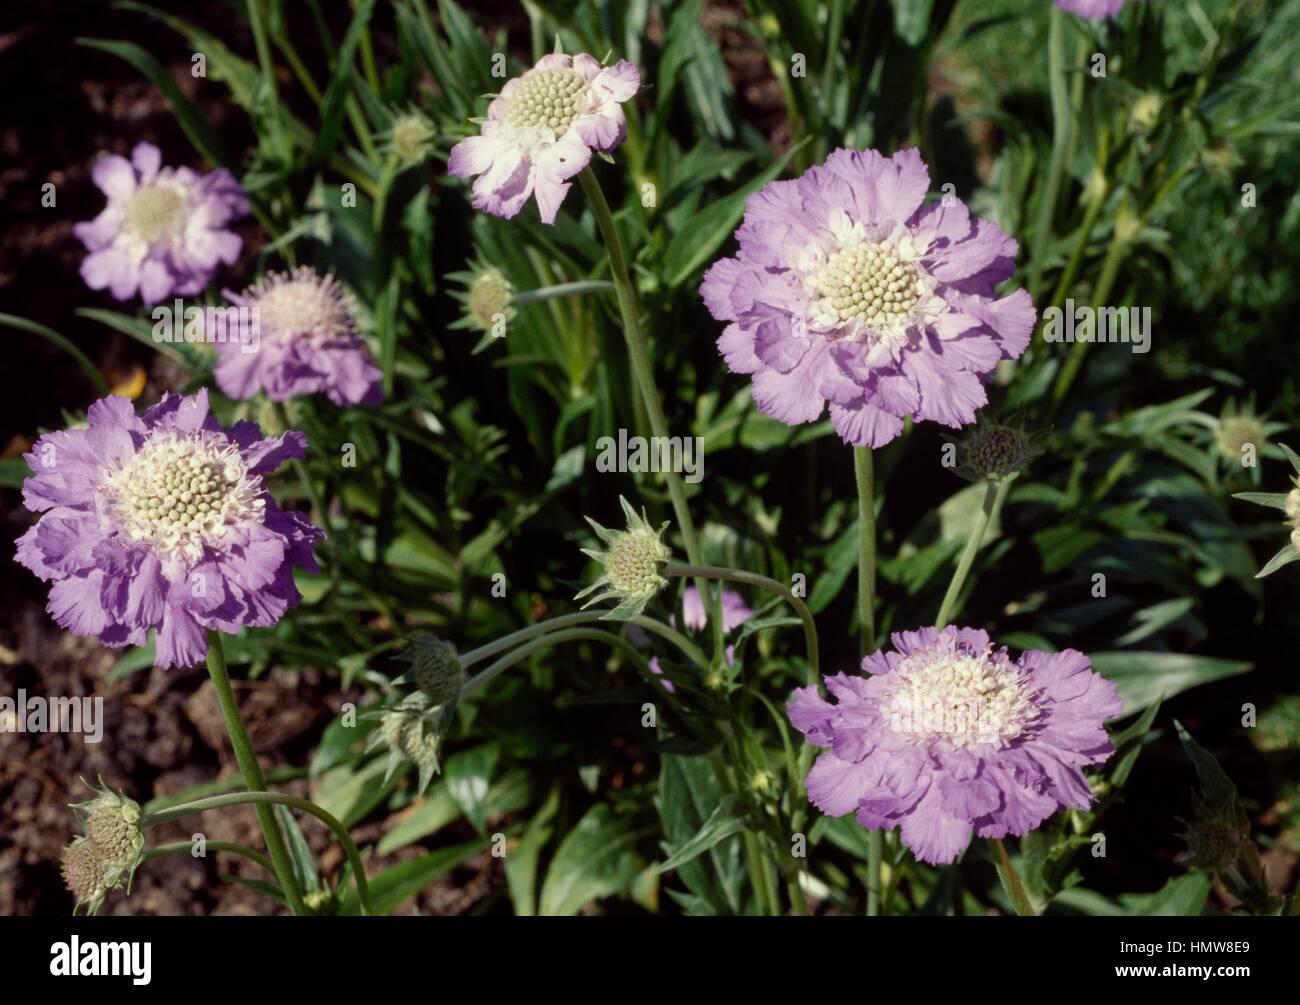 Pincushion Flower Or Scabious Scabiosa Caucasica Stafa Stock Photo